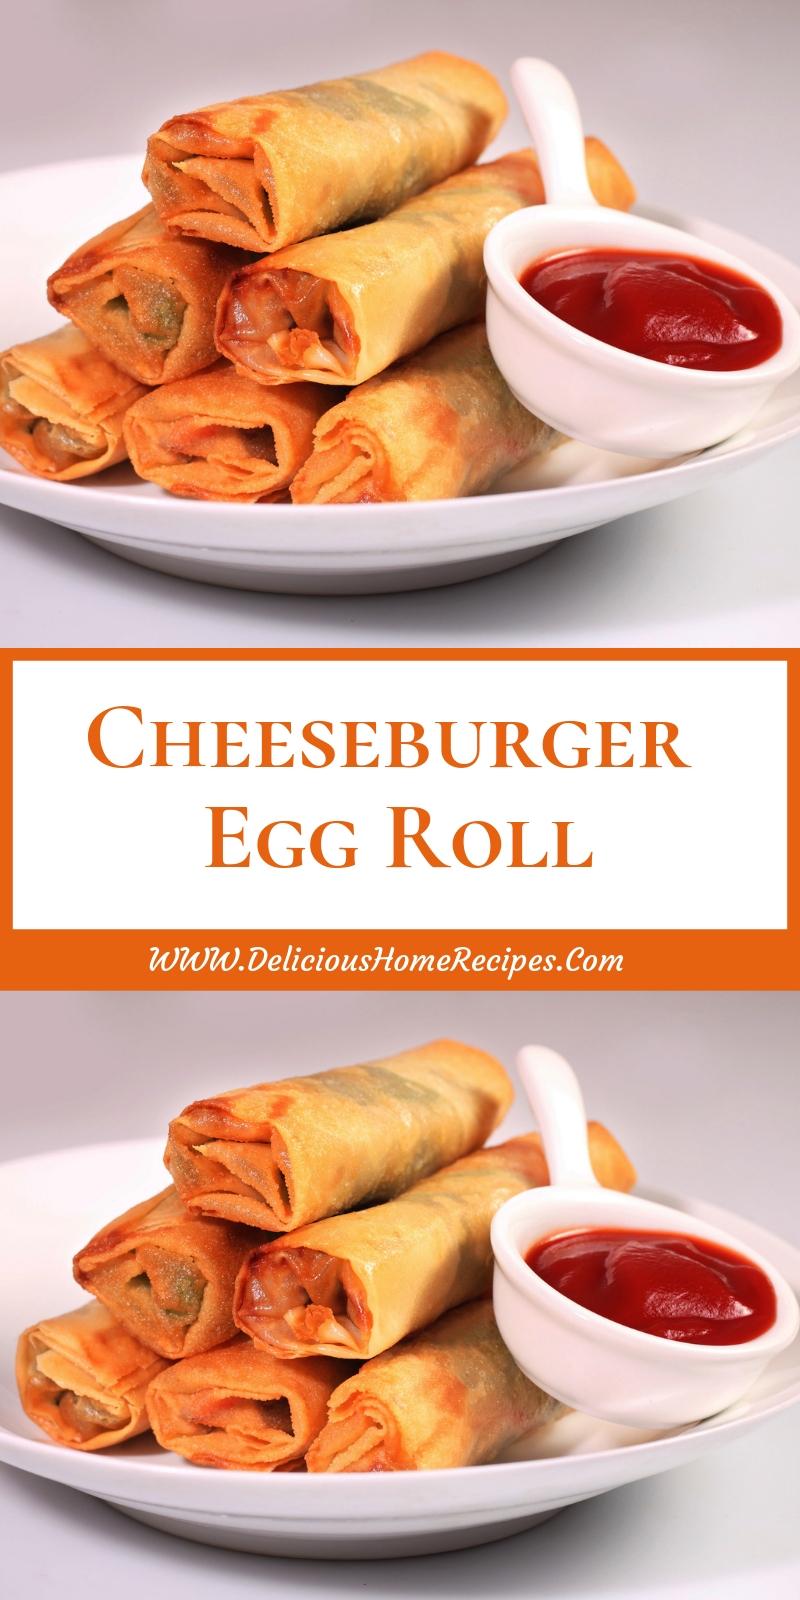 Cheeseburger Egg Roll